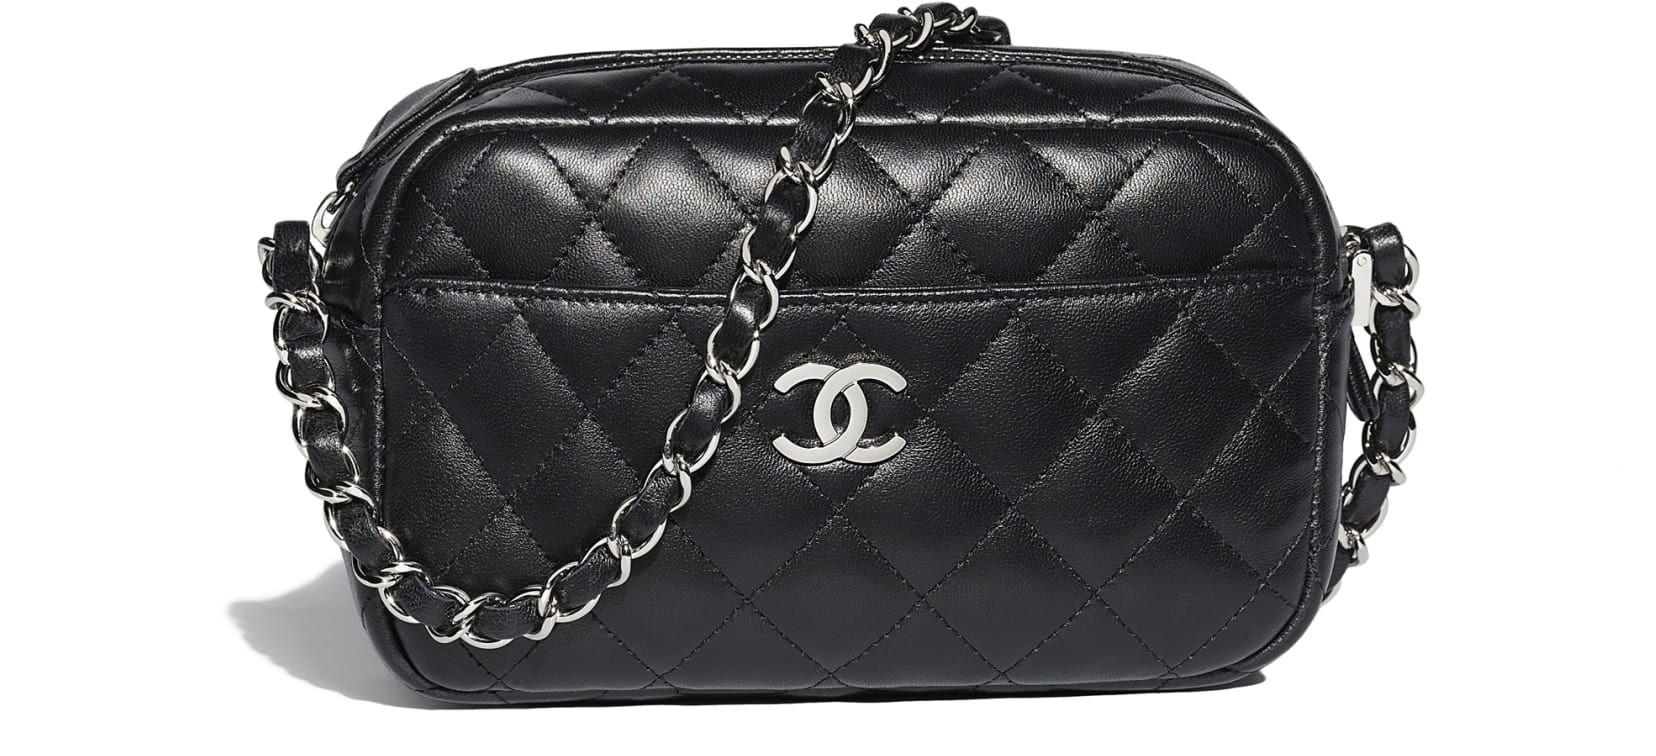 b5f4bb0fa713 Camera Case, lambskin & silver-tone metal, black - CHANEL | Chanel ...